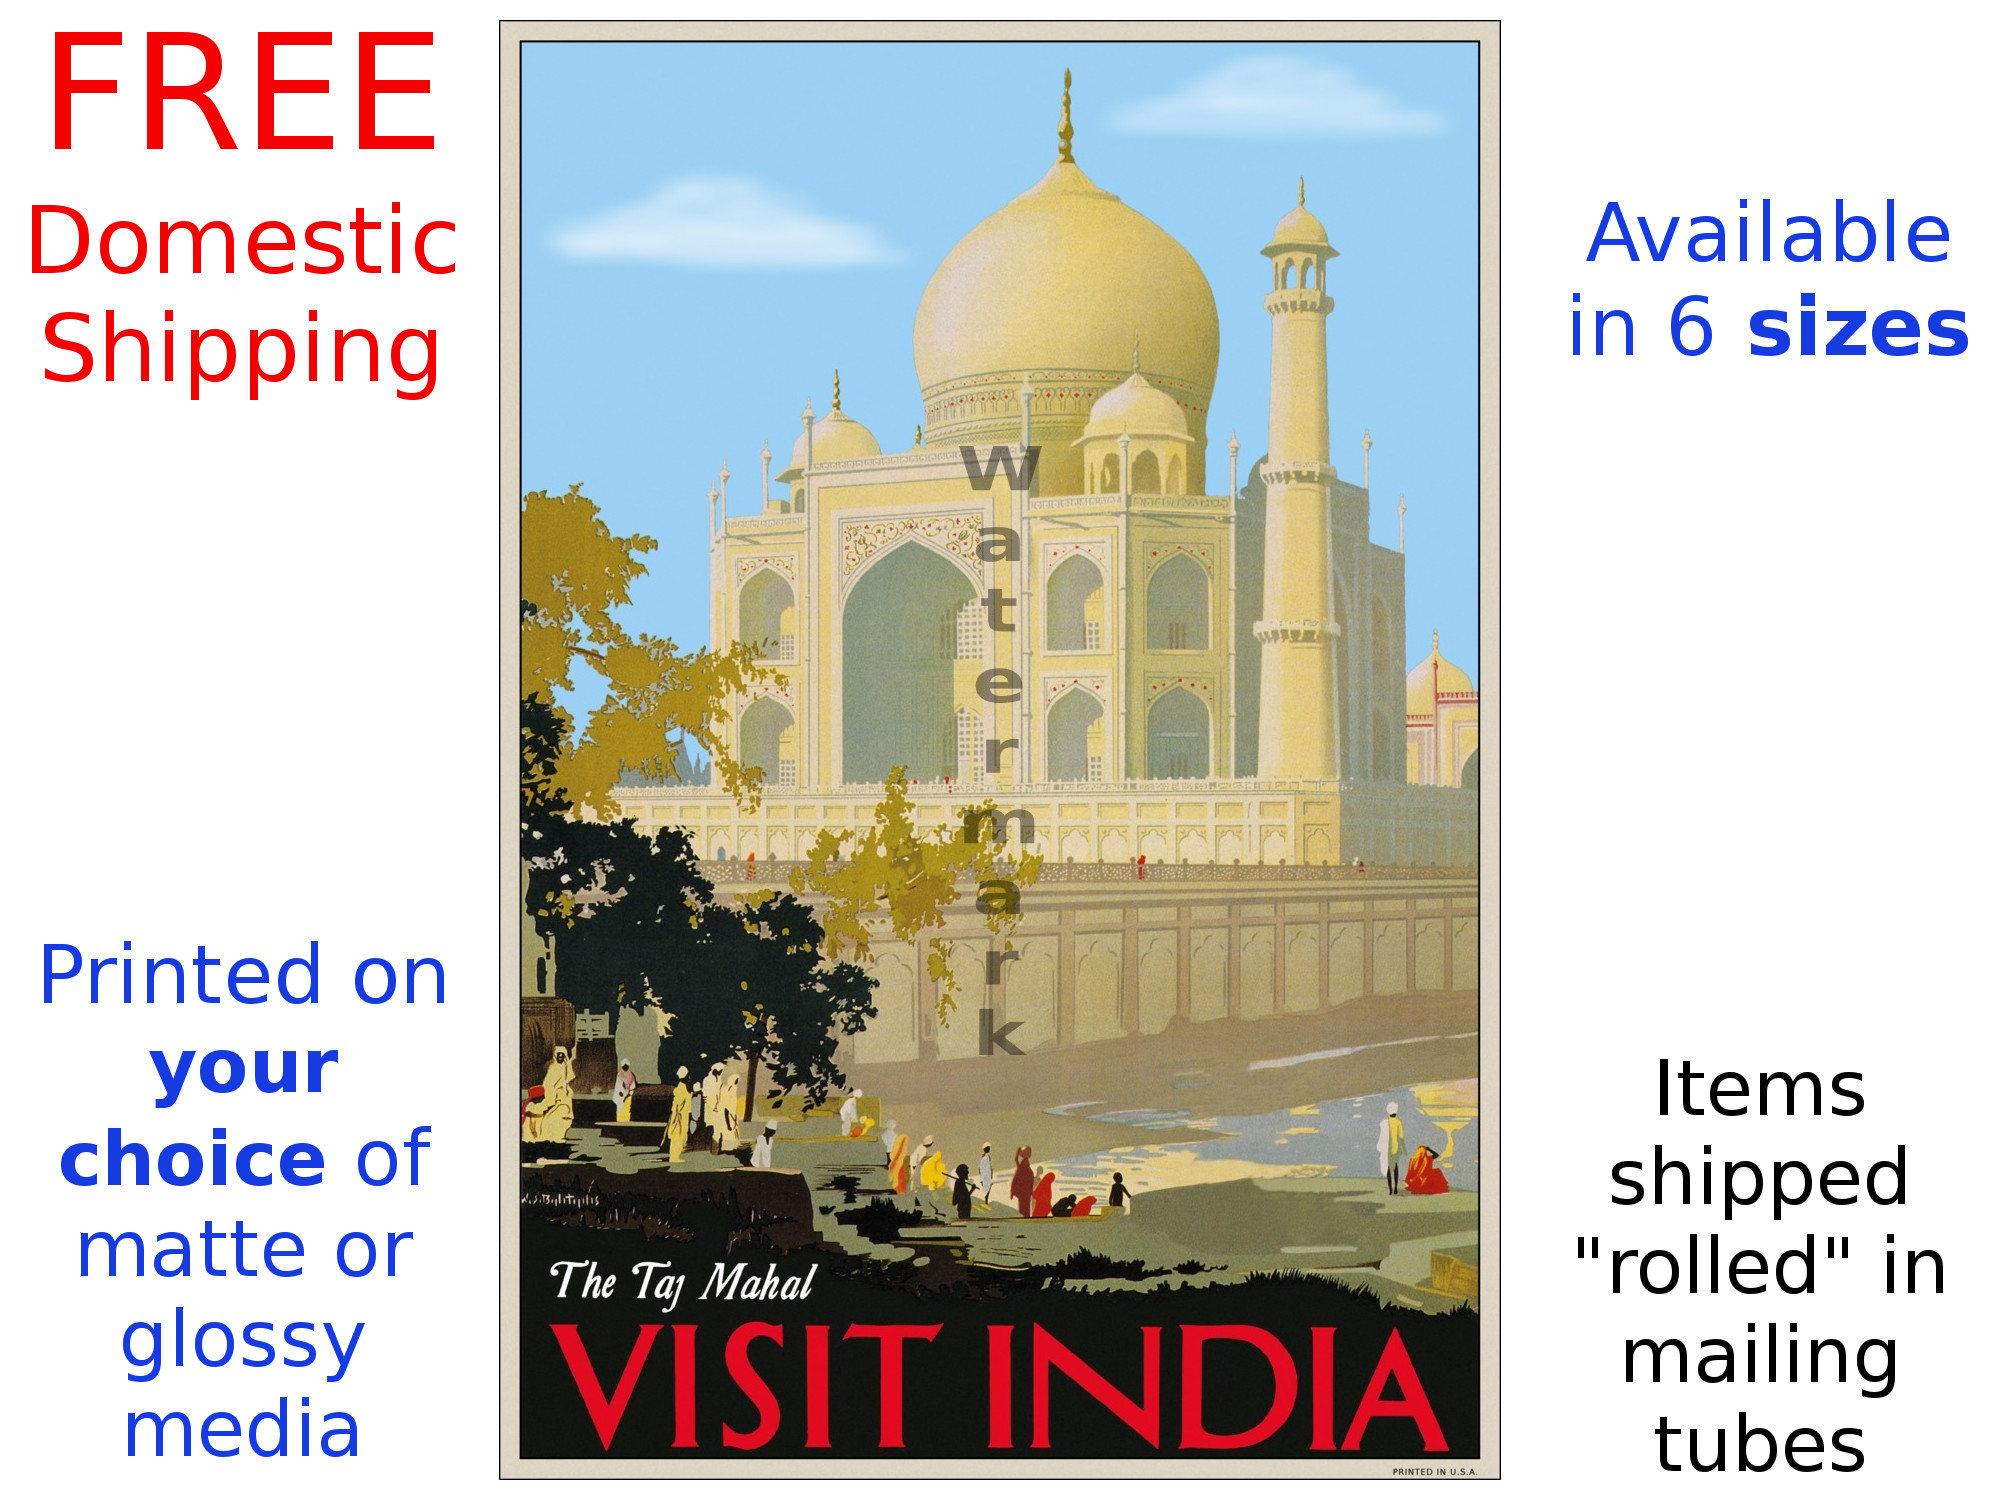 India Travel Poster The Taj Mahal Visit India Vintage